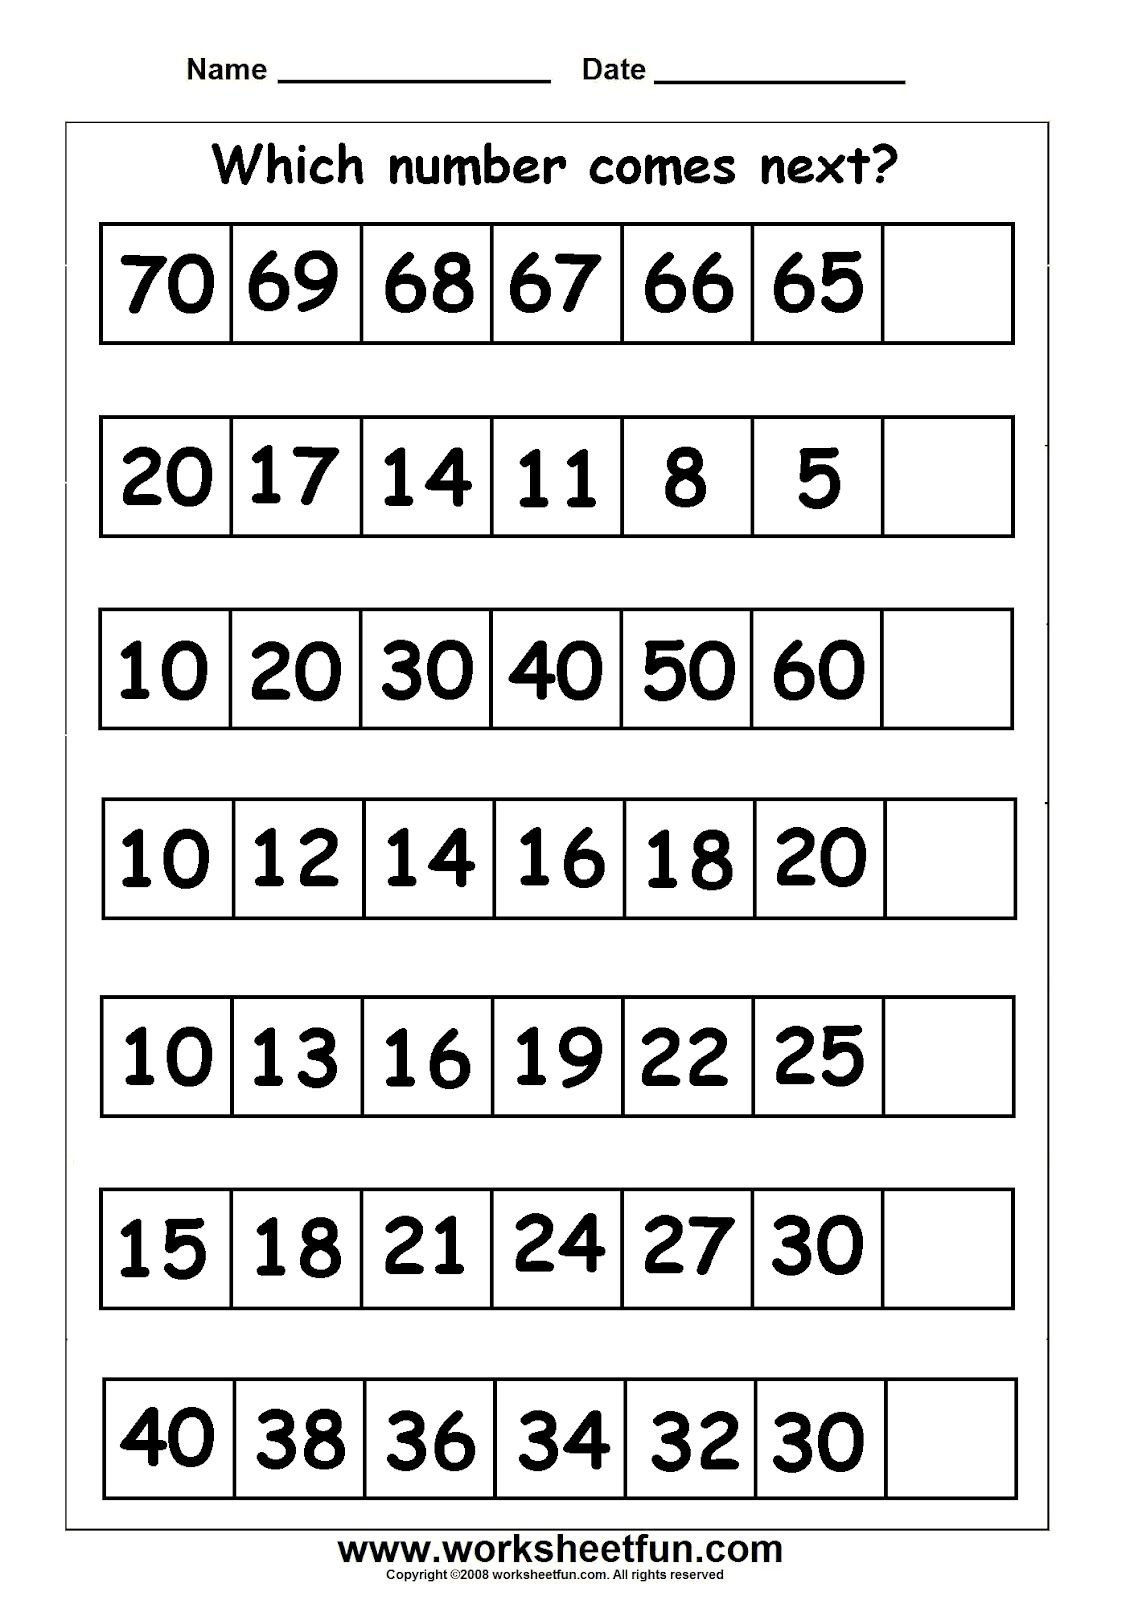 21 Best Basic Addition Worksheets For First Grade Images